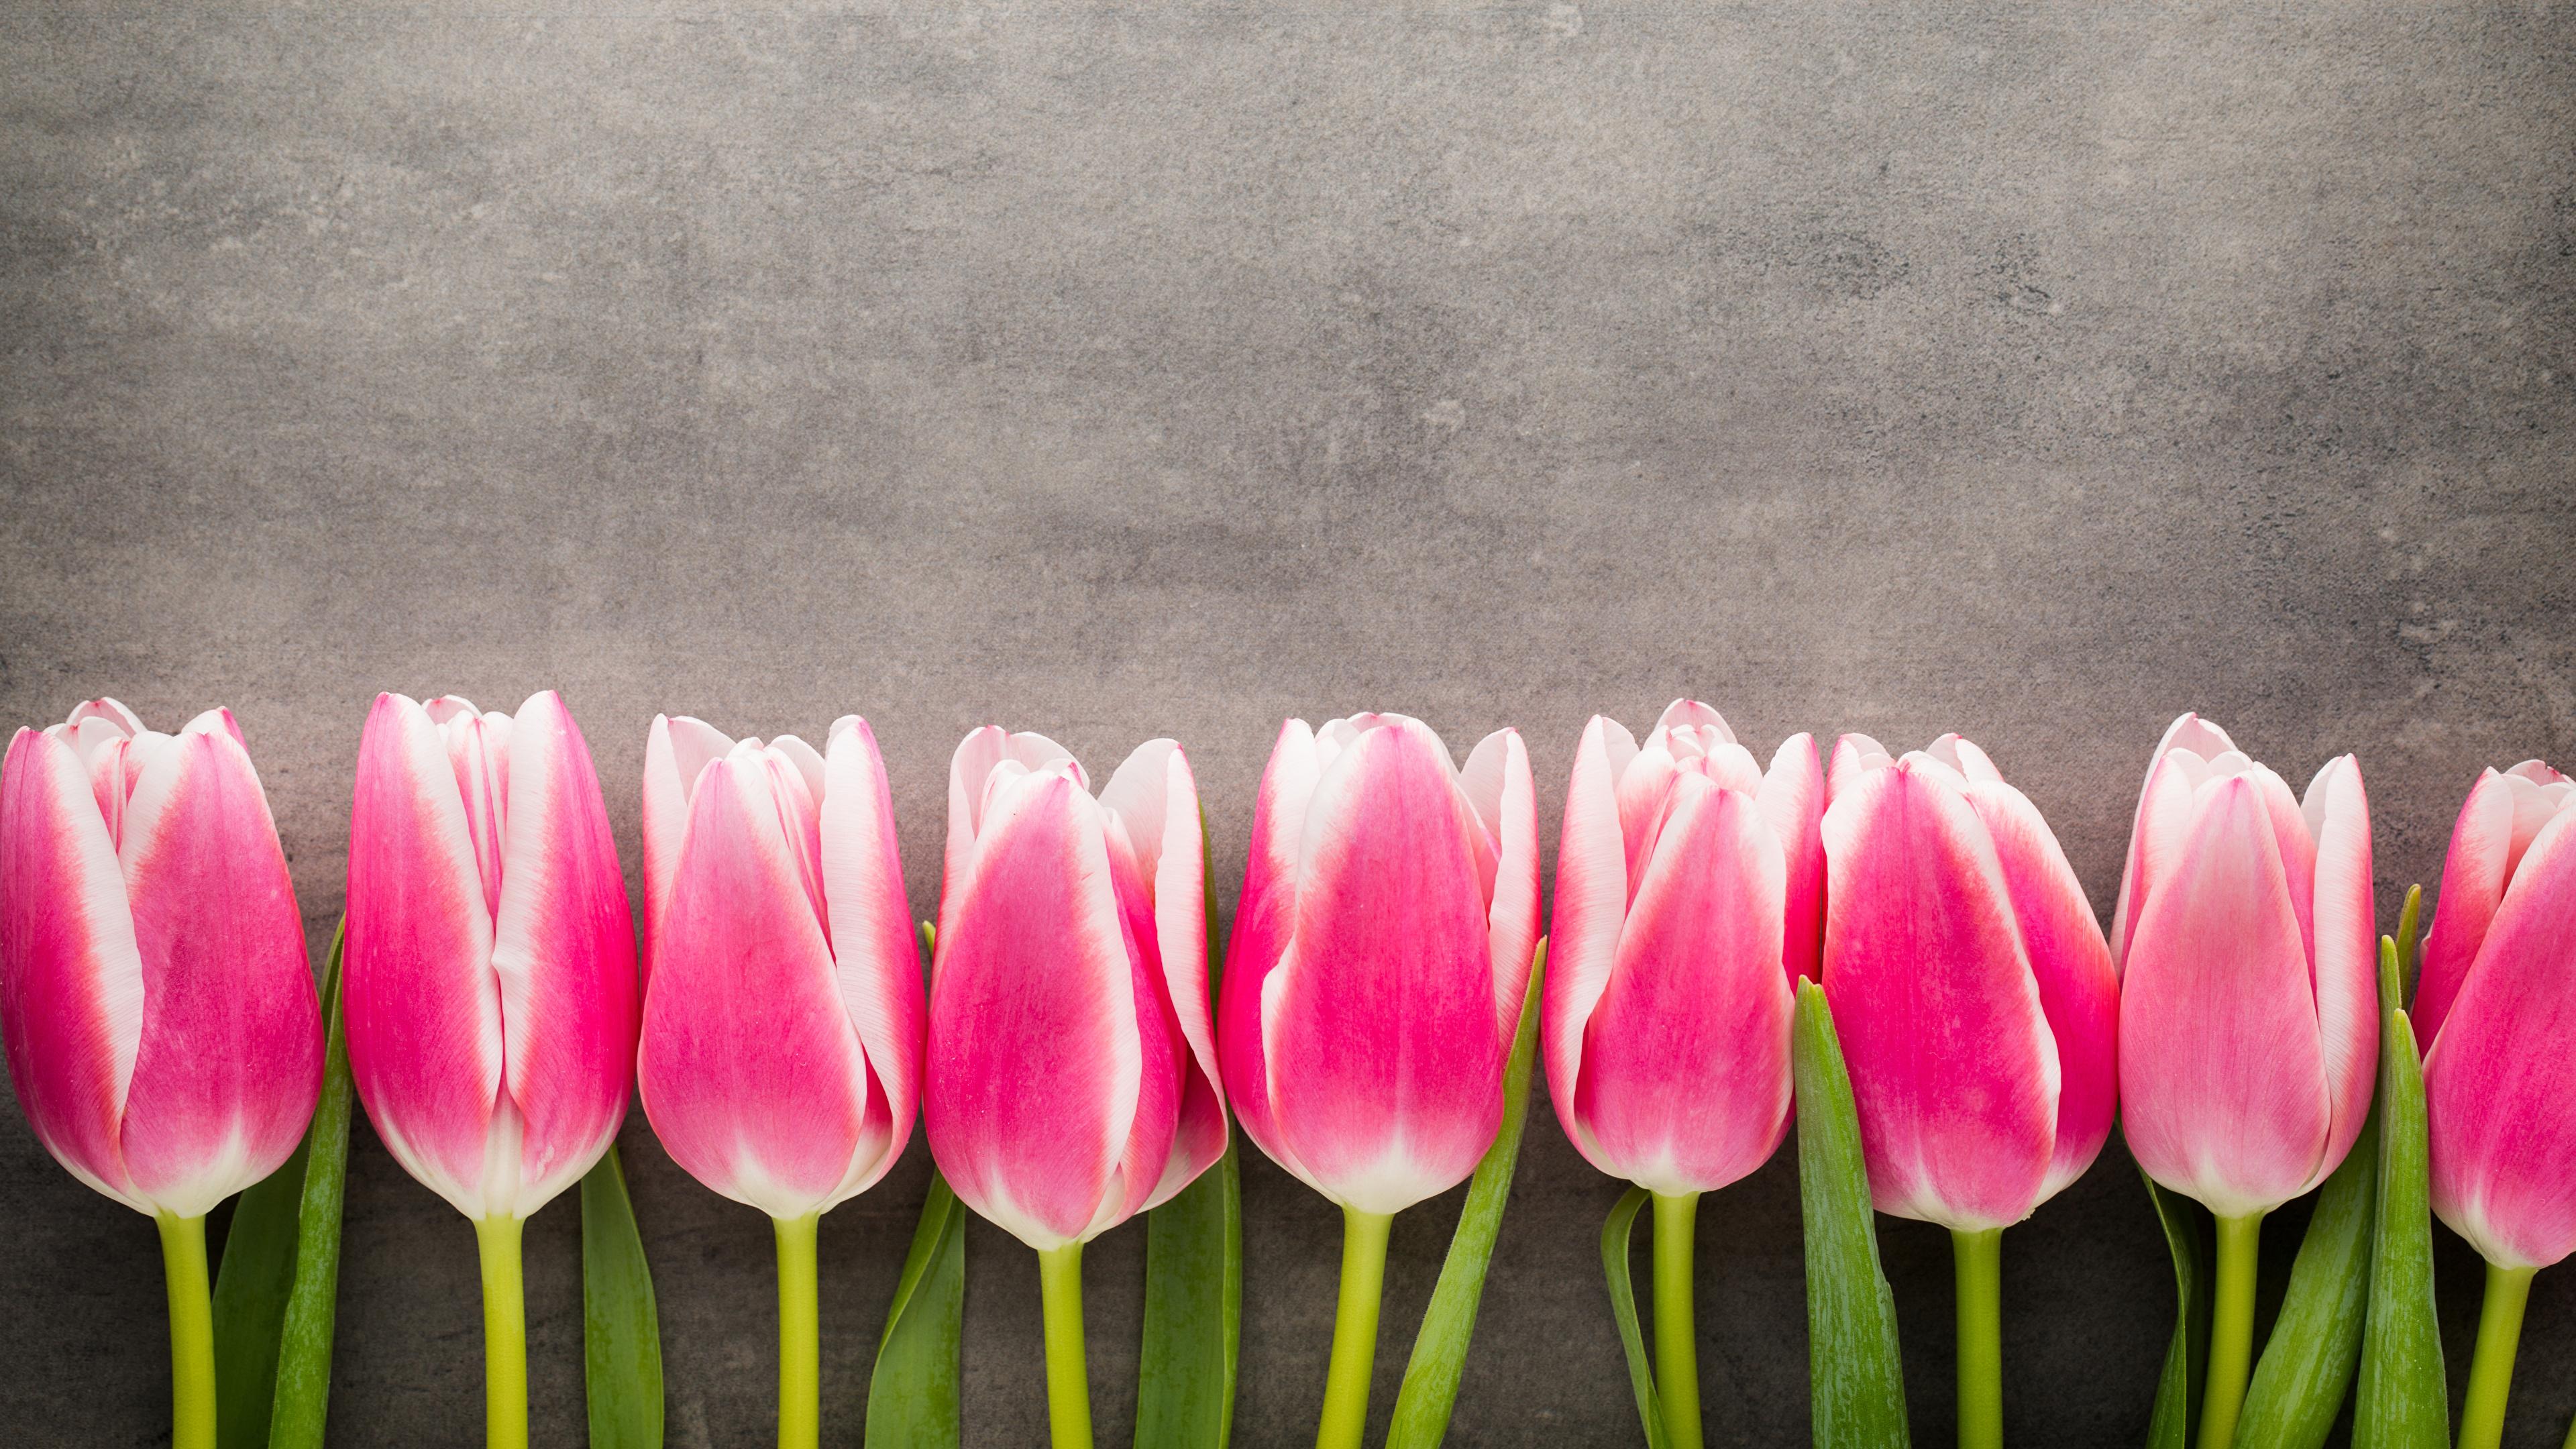 Картинка розовая Тюльпаны цветок 3840x2160 розовых розовые Розовый тюльпан Цветы